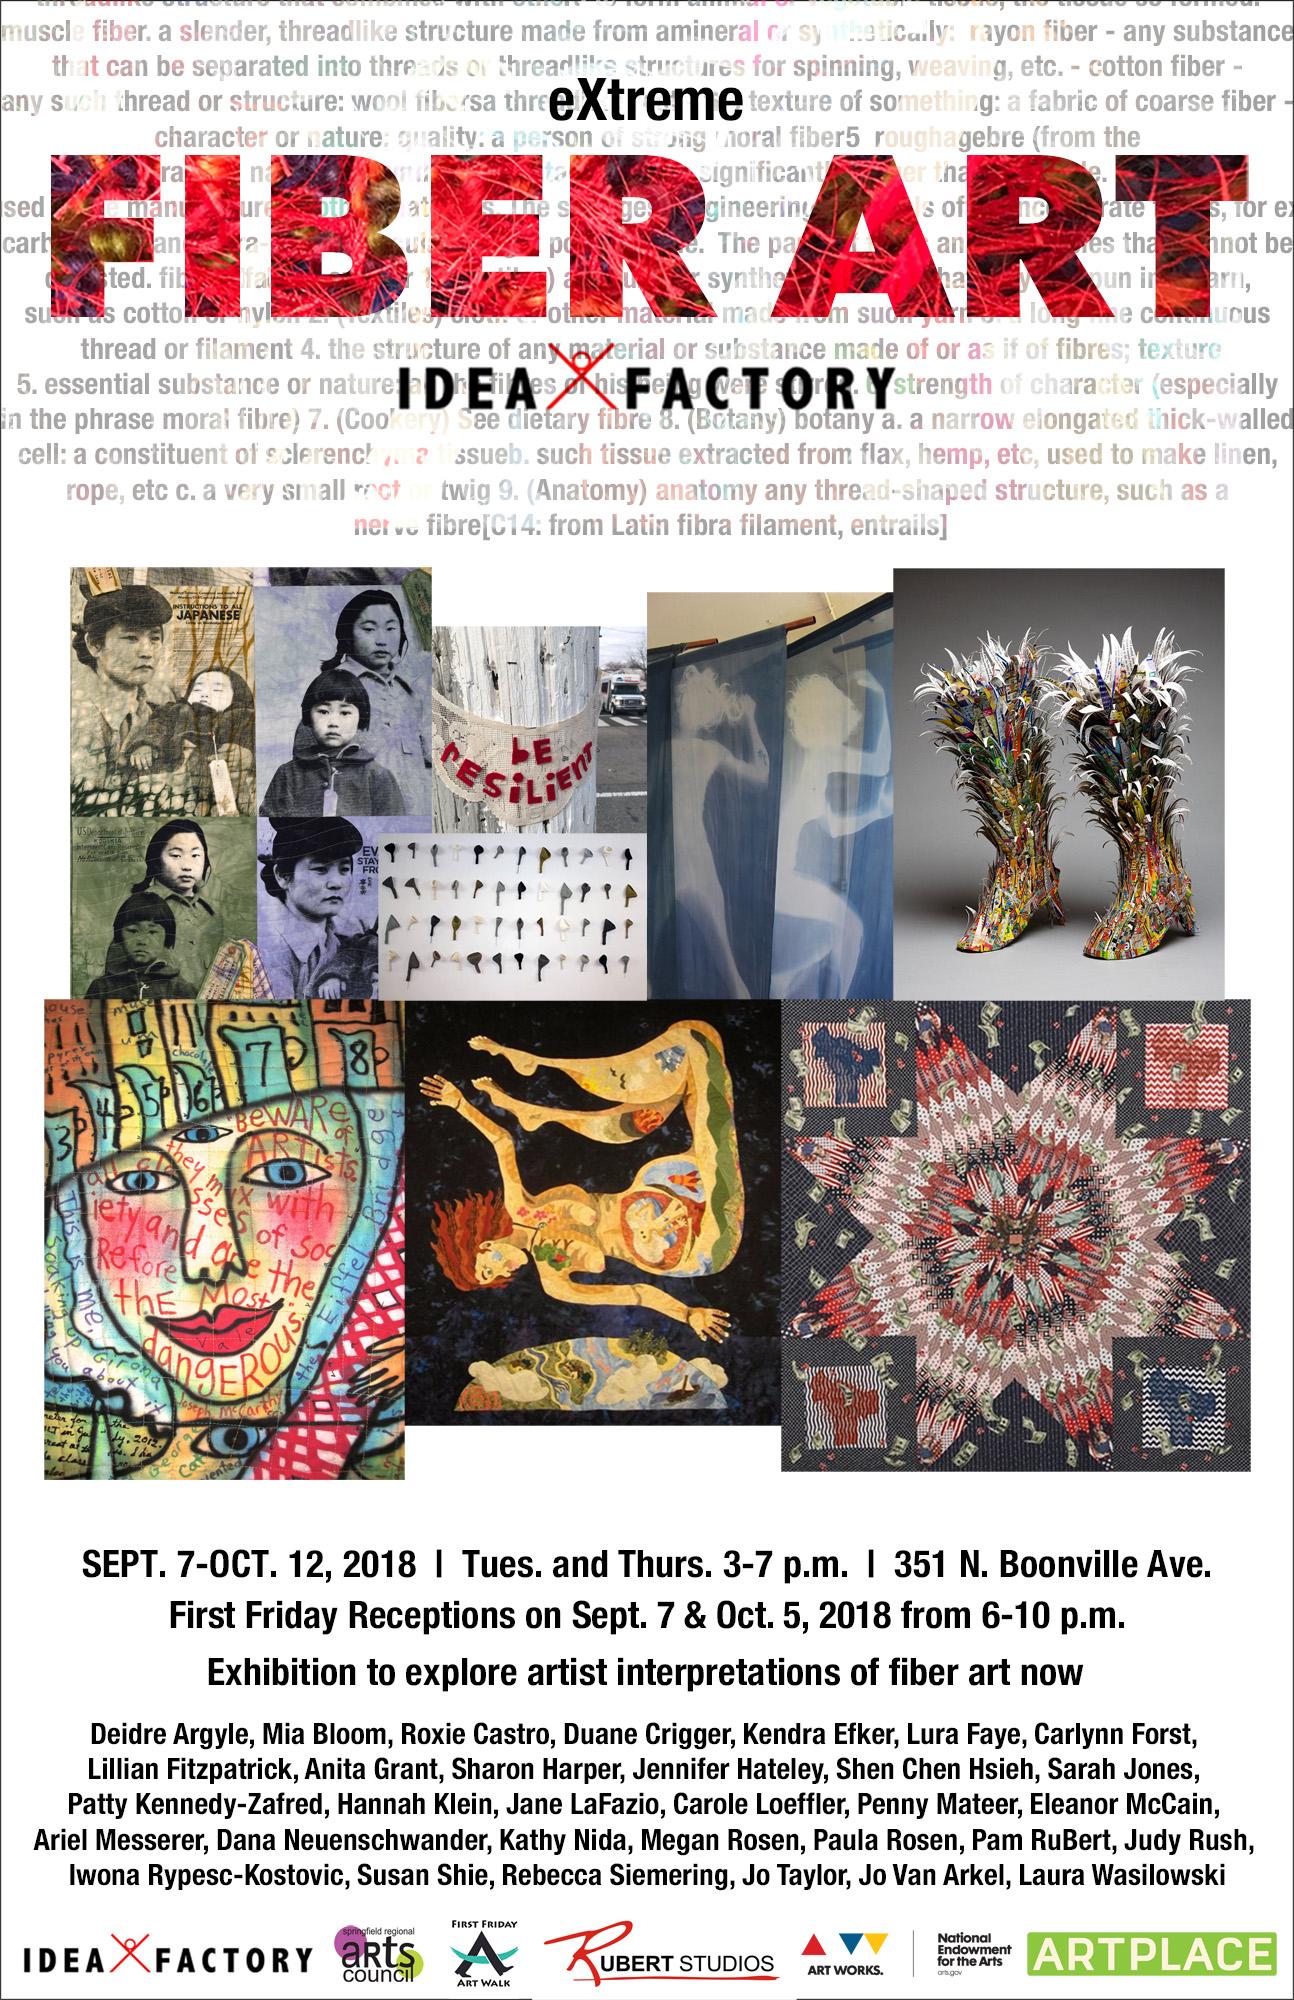 eXtreme Fiber Art exhibition Sept. 7-Oct. 12